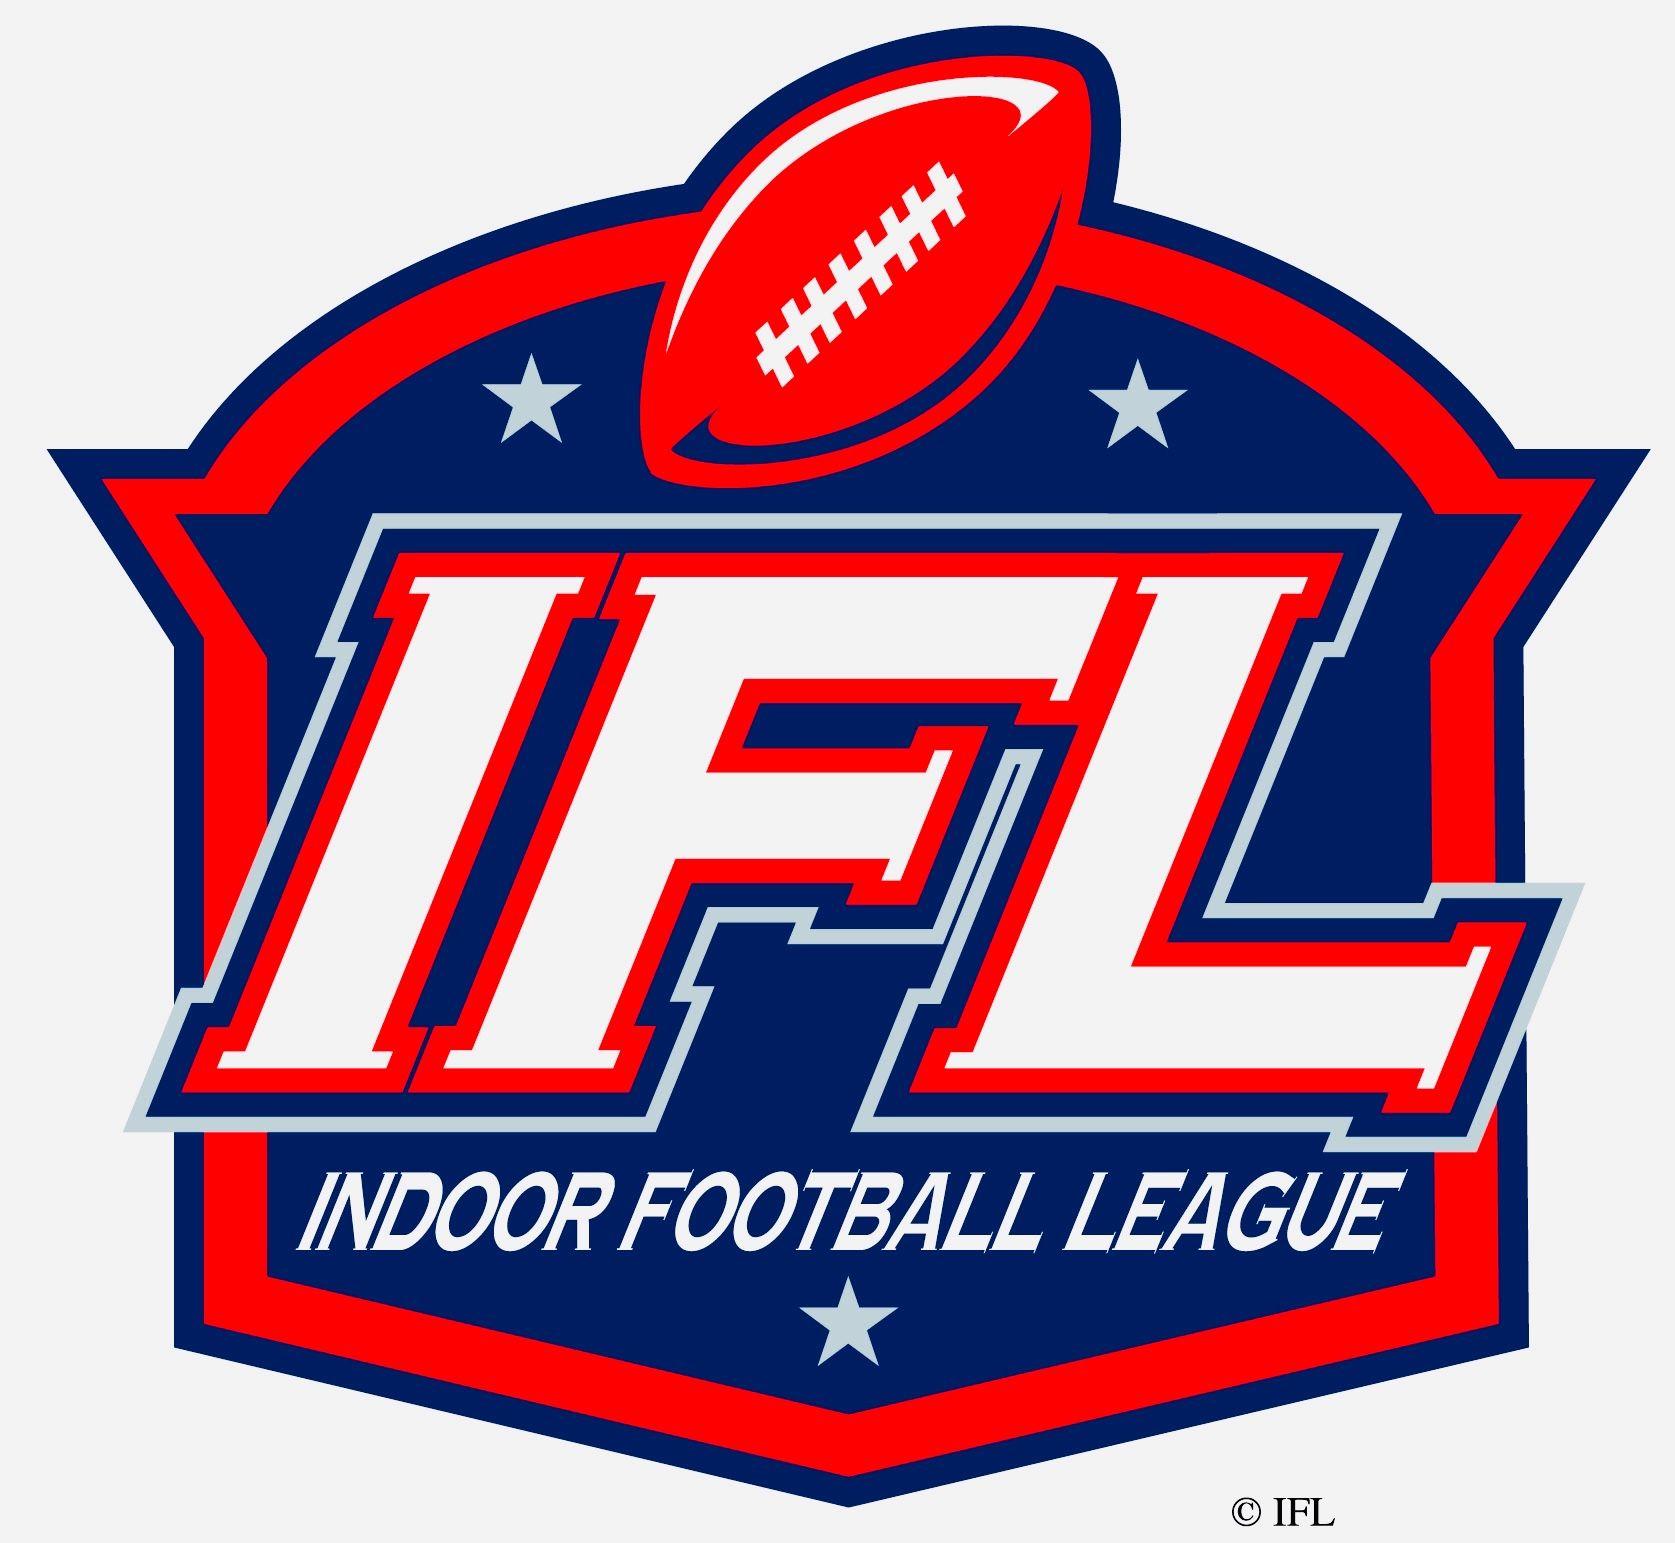 19992000 Football league, Sports logo, Football